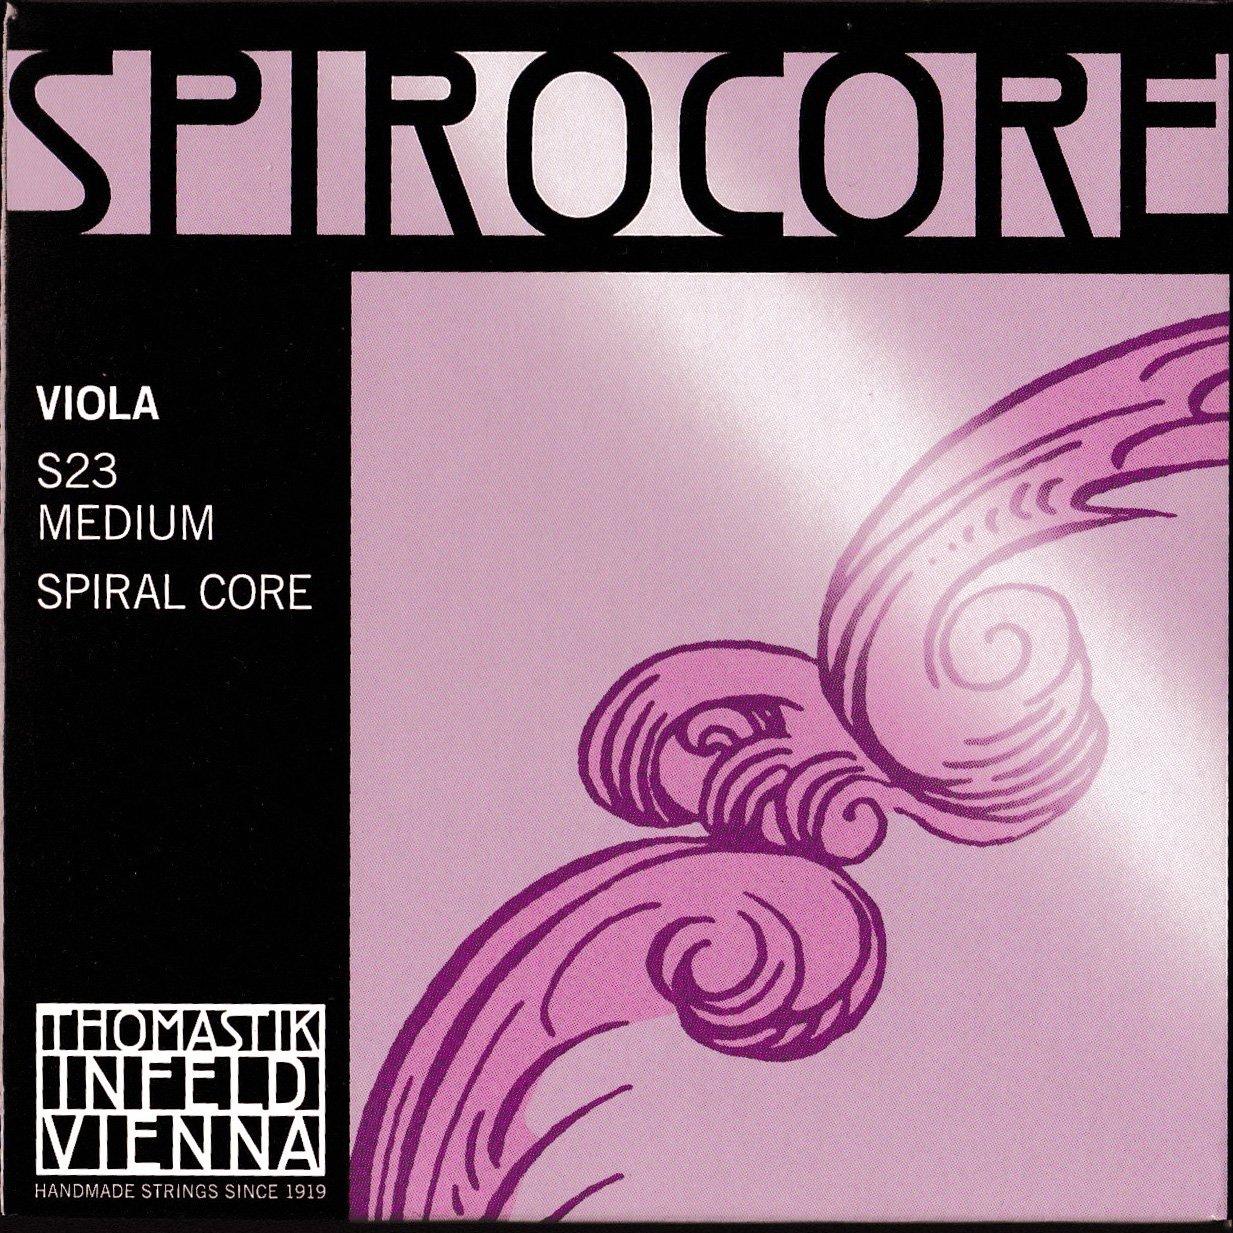 Thomastik-Infeld S23 Spirocore Medium Gauge, Set of 4, Viola Strings, 4/4